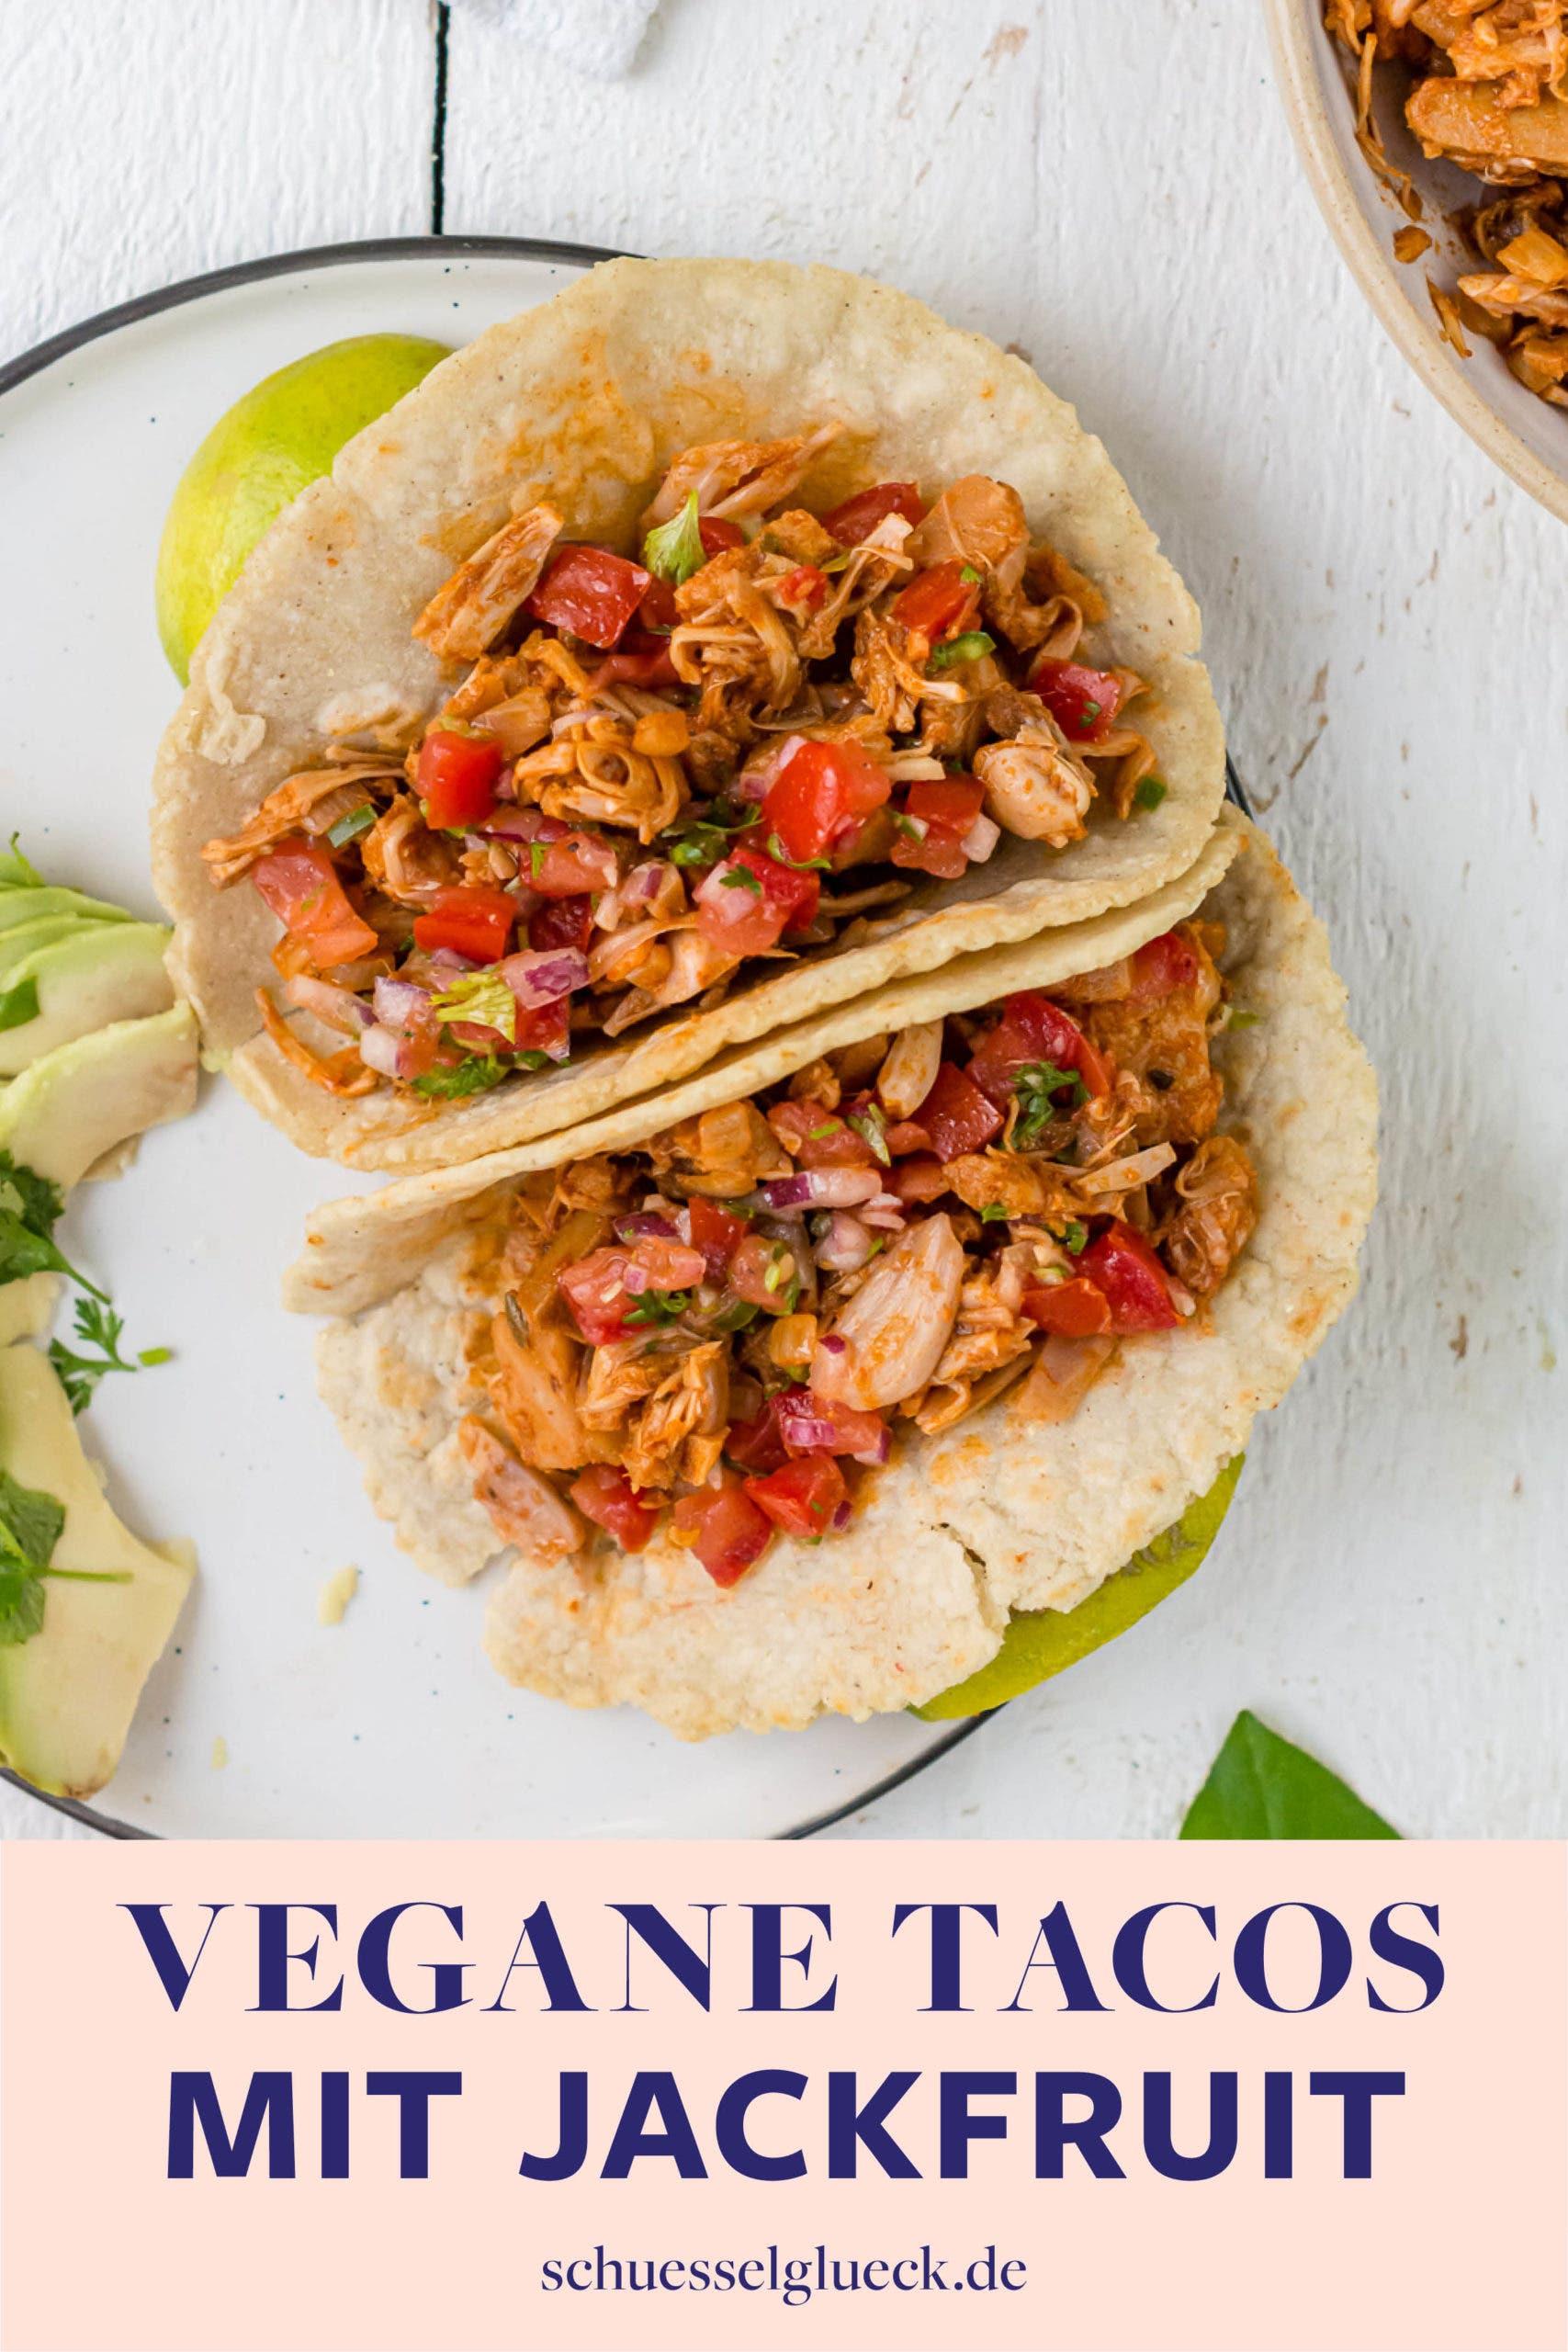 Die besten veganen Tacos mit Jackfruit (ohne Soja)